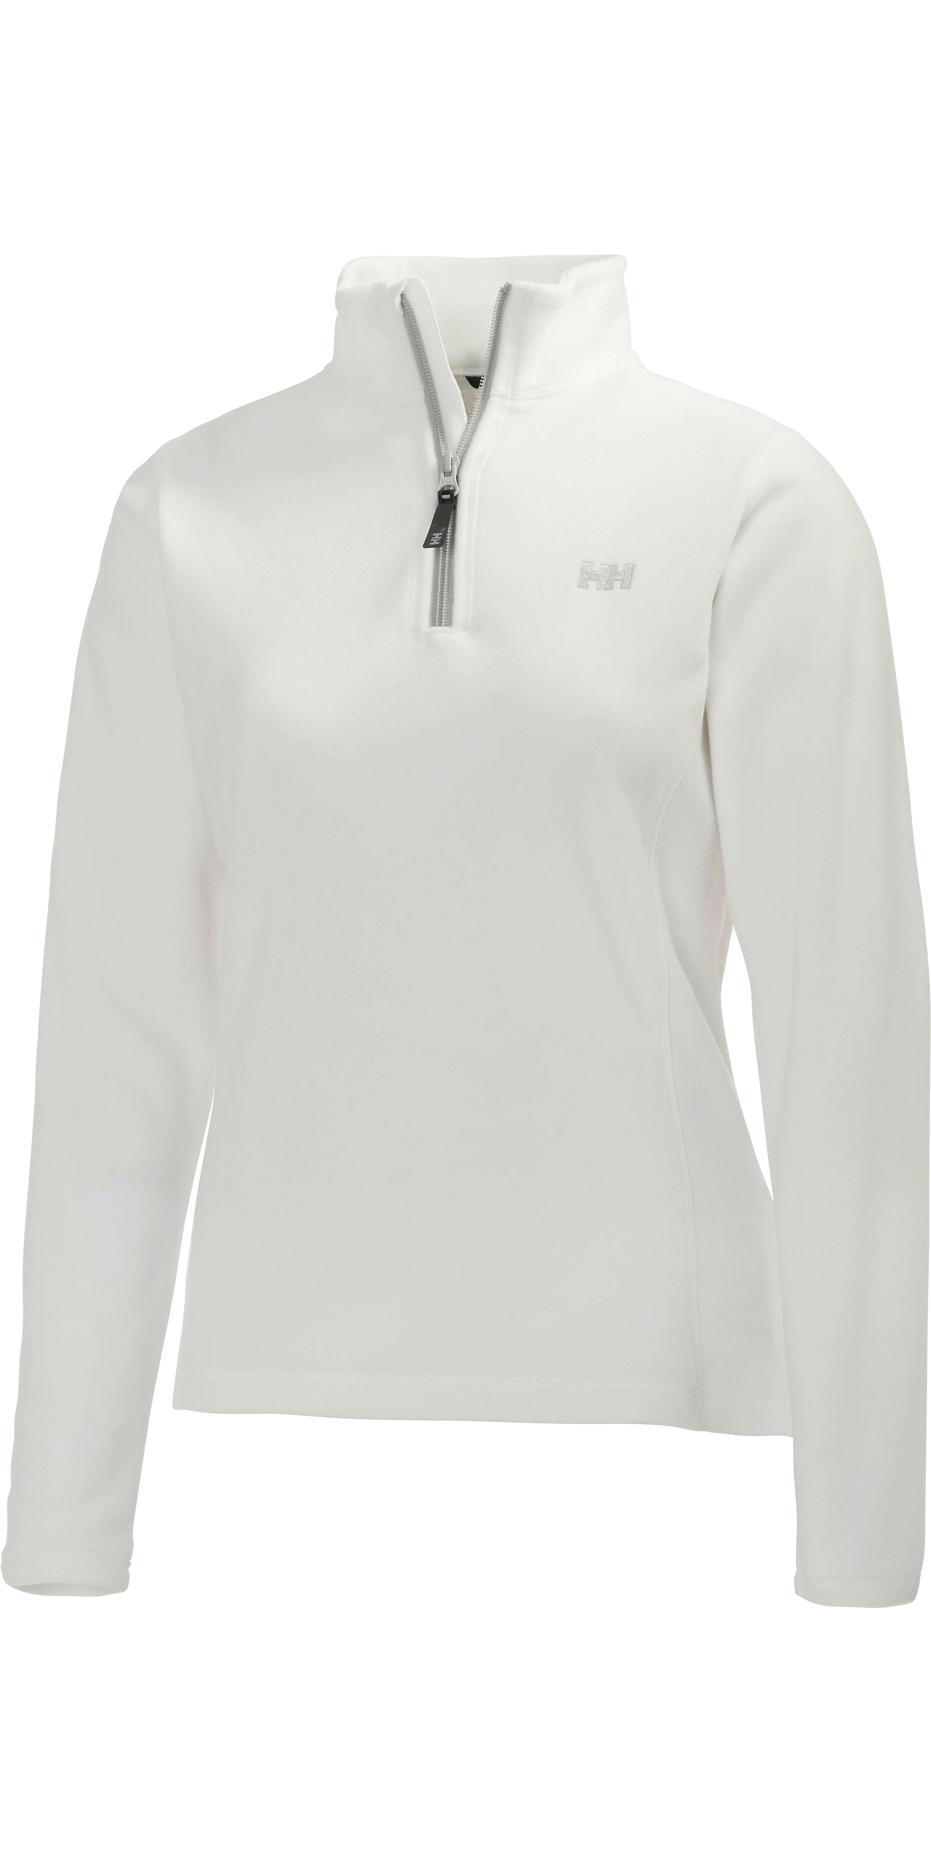 ef6ac122e 2019 Helly Hansen Womens Daybreaker 1 2 Zip Fleece White Silver 50845 -  50845 - Fleeces - Shore Wear